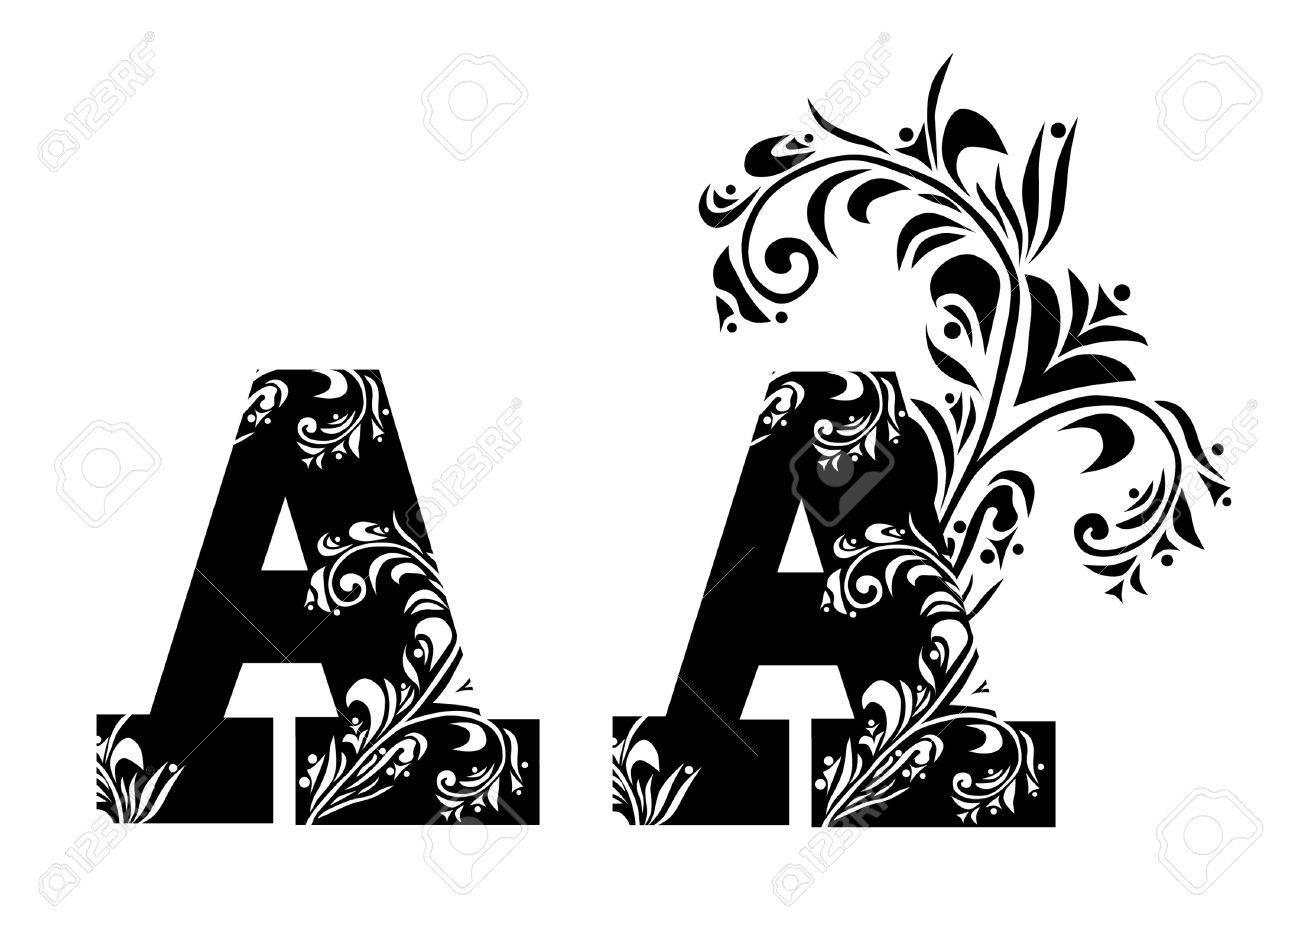 Decorative Letter A.Decorative Letter A For Your Design